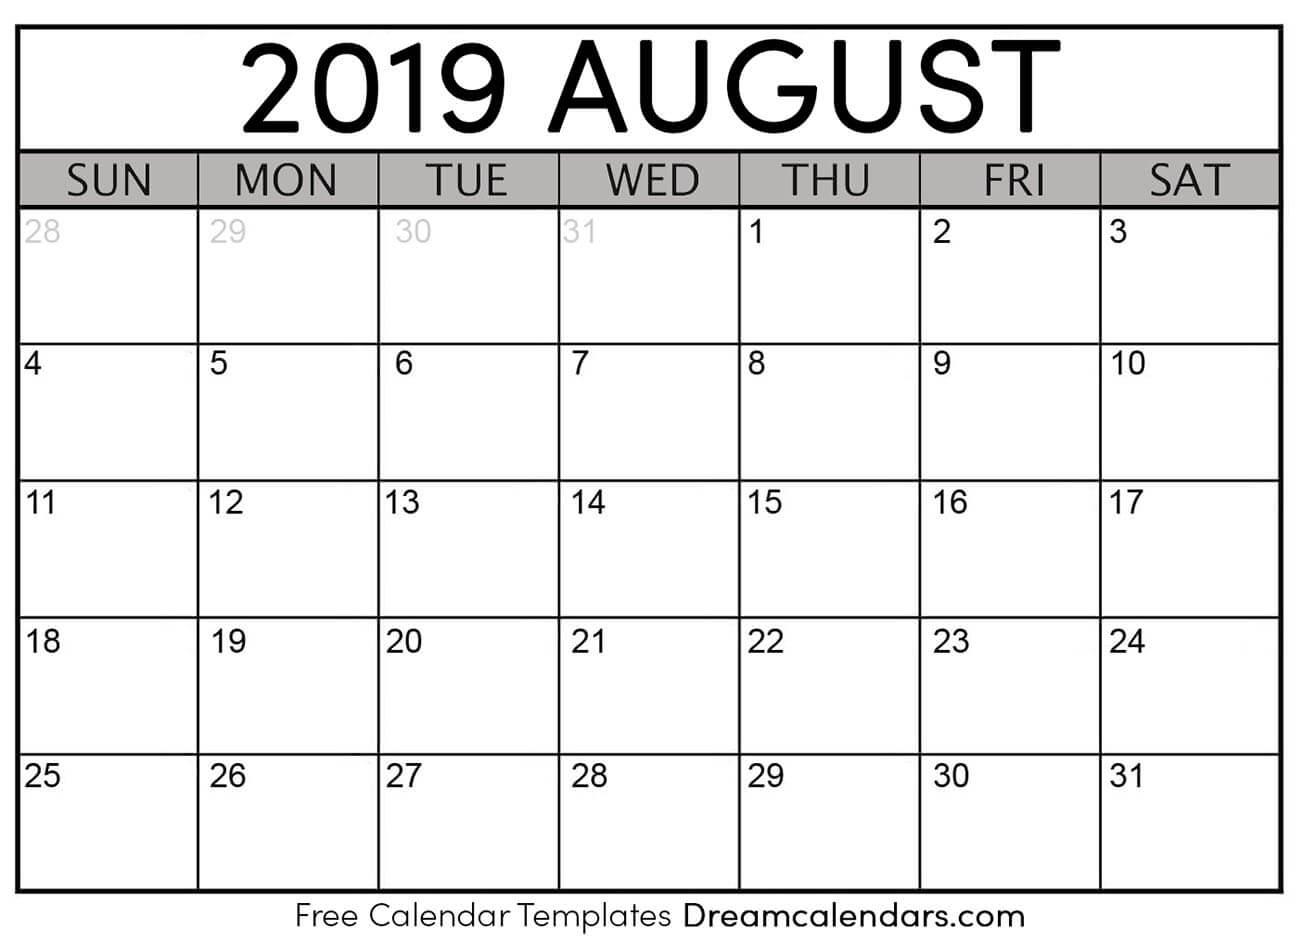 Free August 2019 Printable Calendar | Dream Calendars